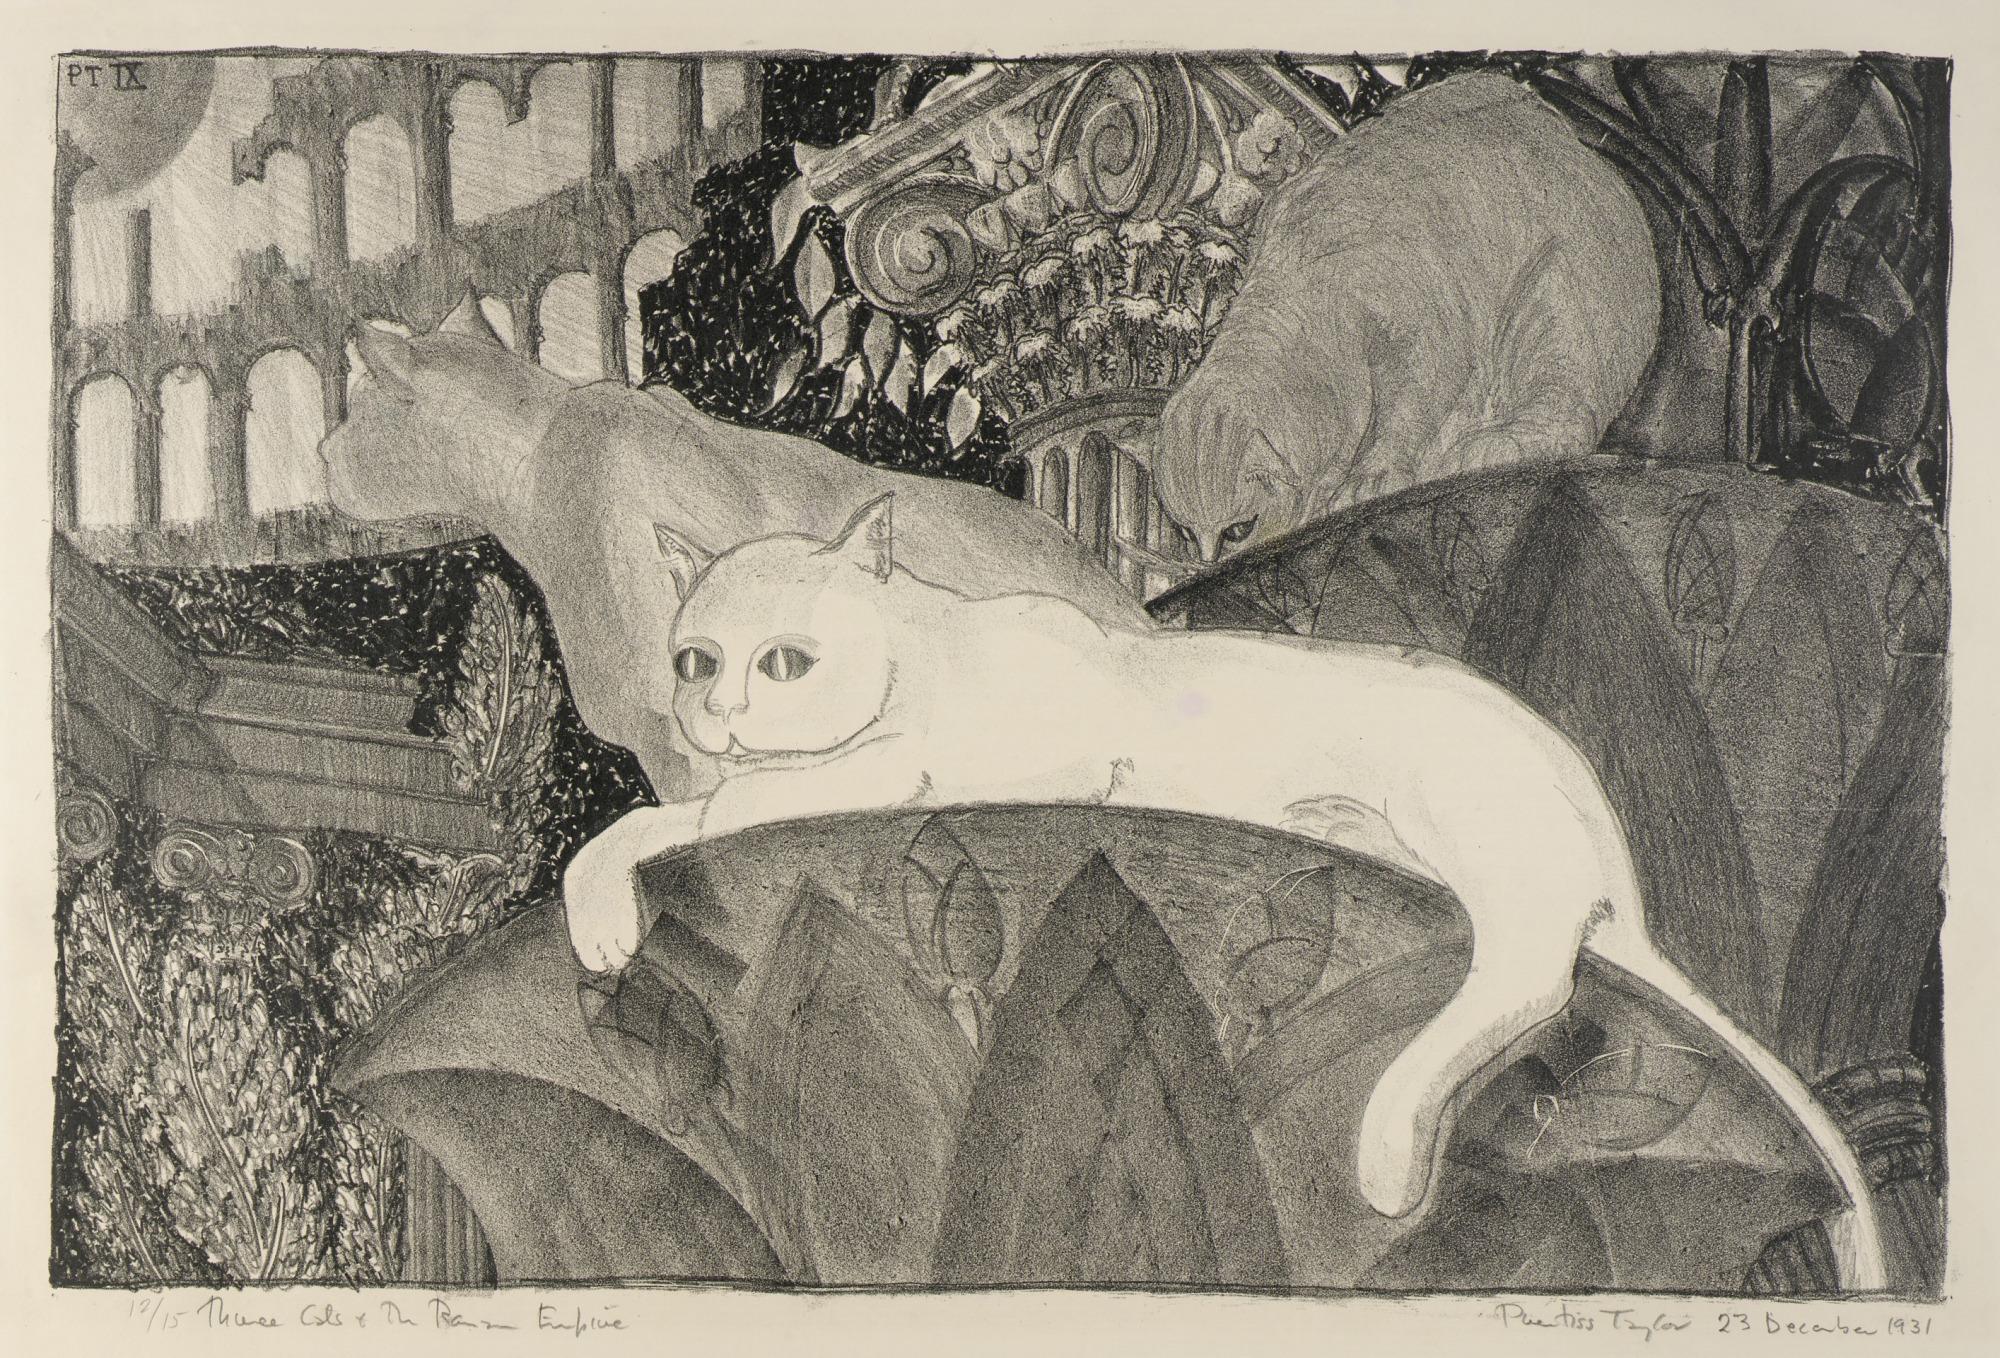 Three Cats and the Roman Empire